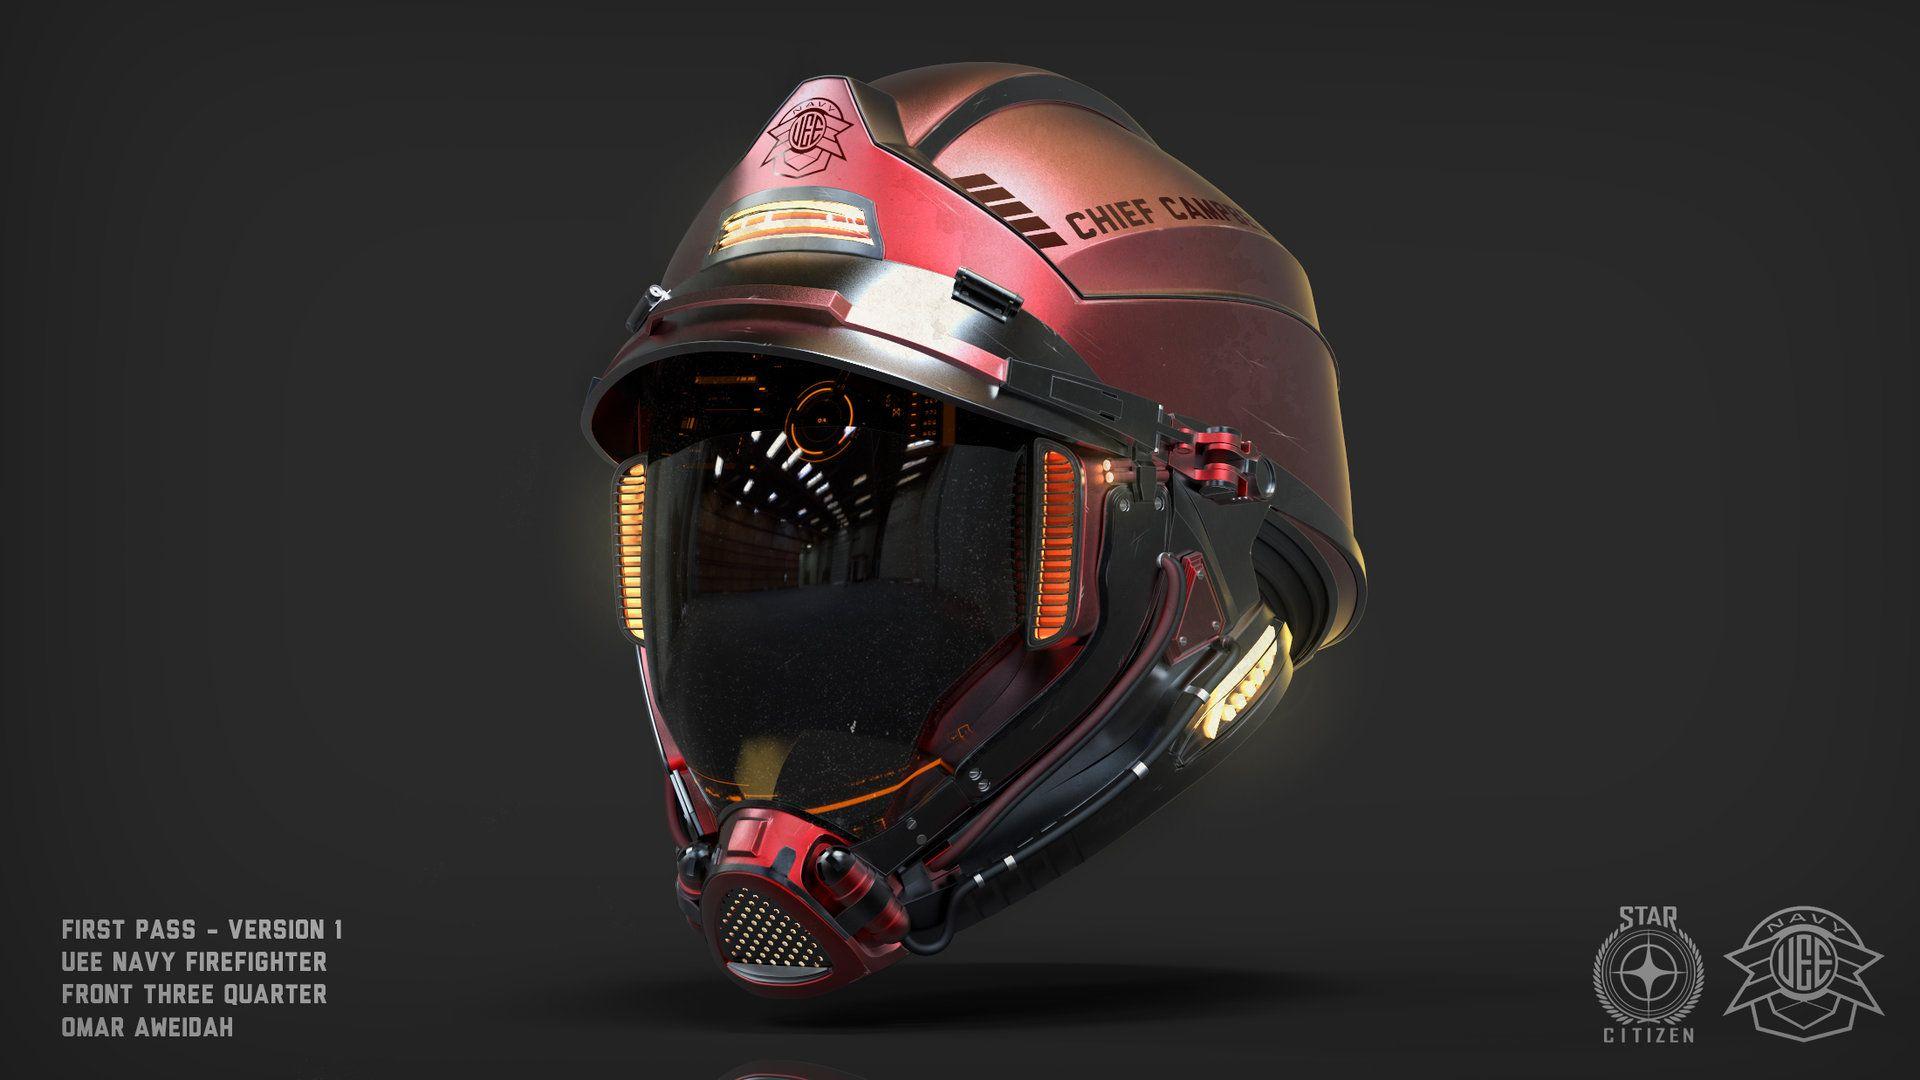 Fi fireman tattoo designs - Artstation Uee Navy Fireman Helmet Concept Omar Aweidah